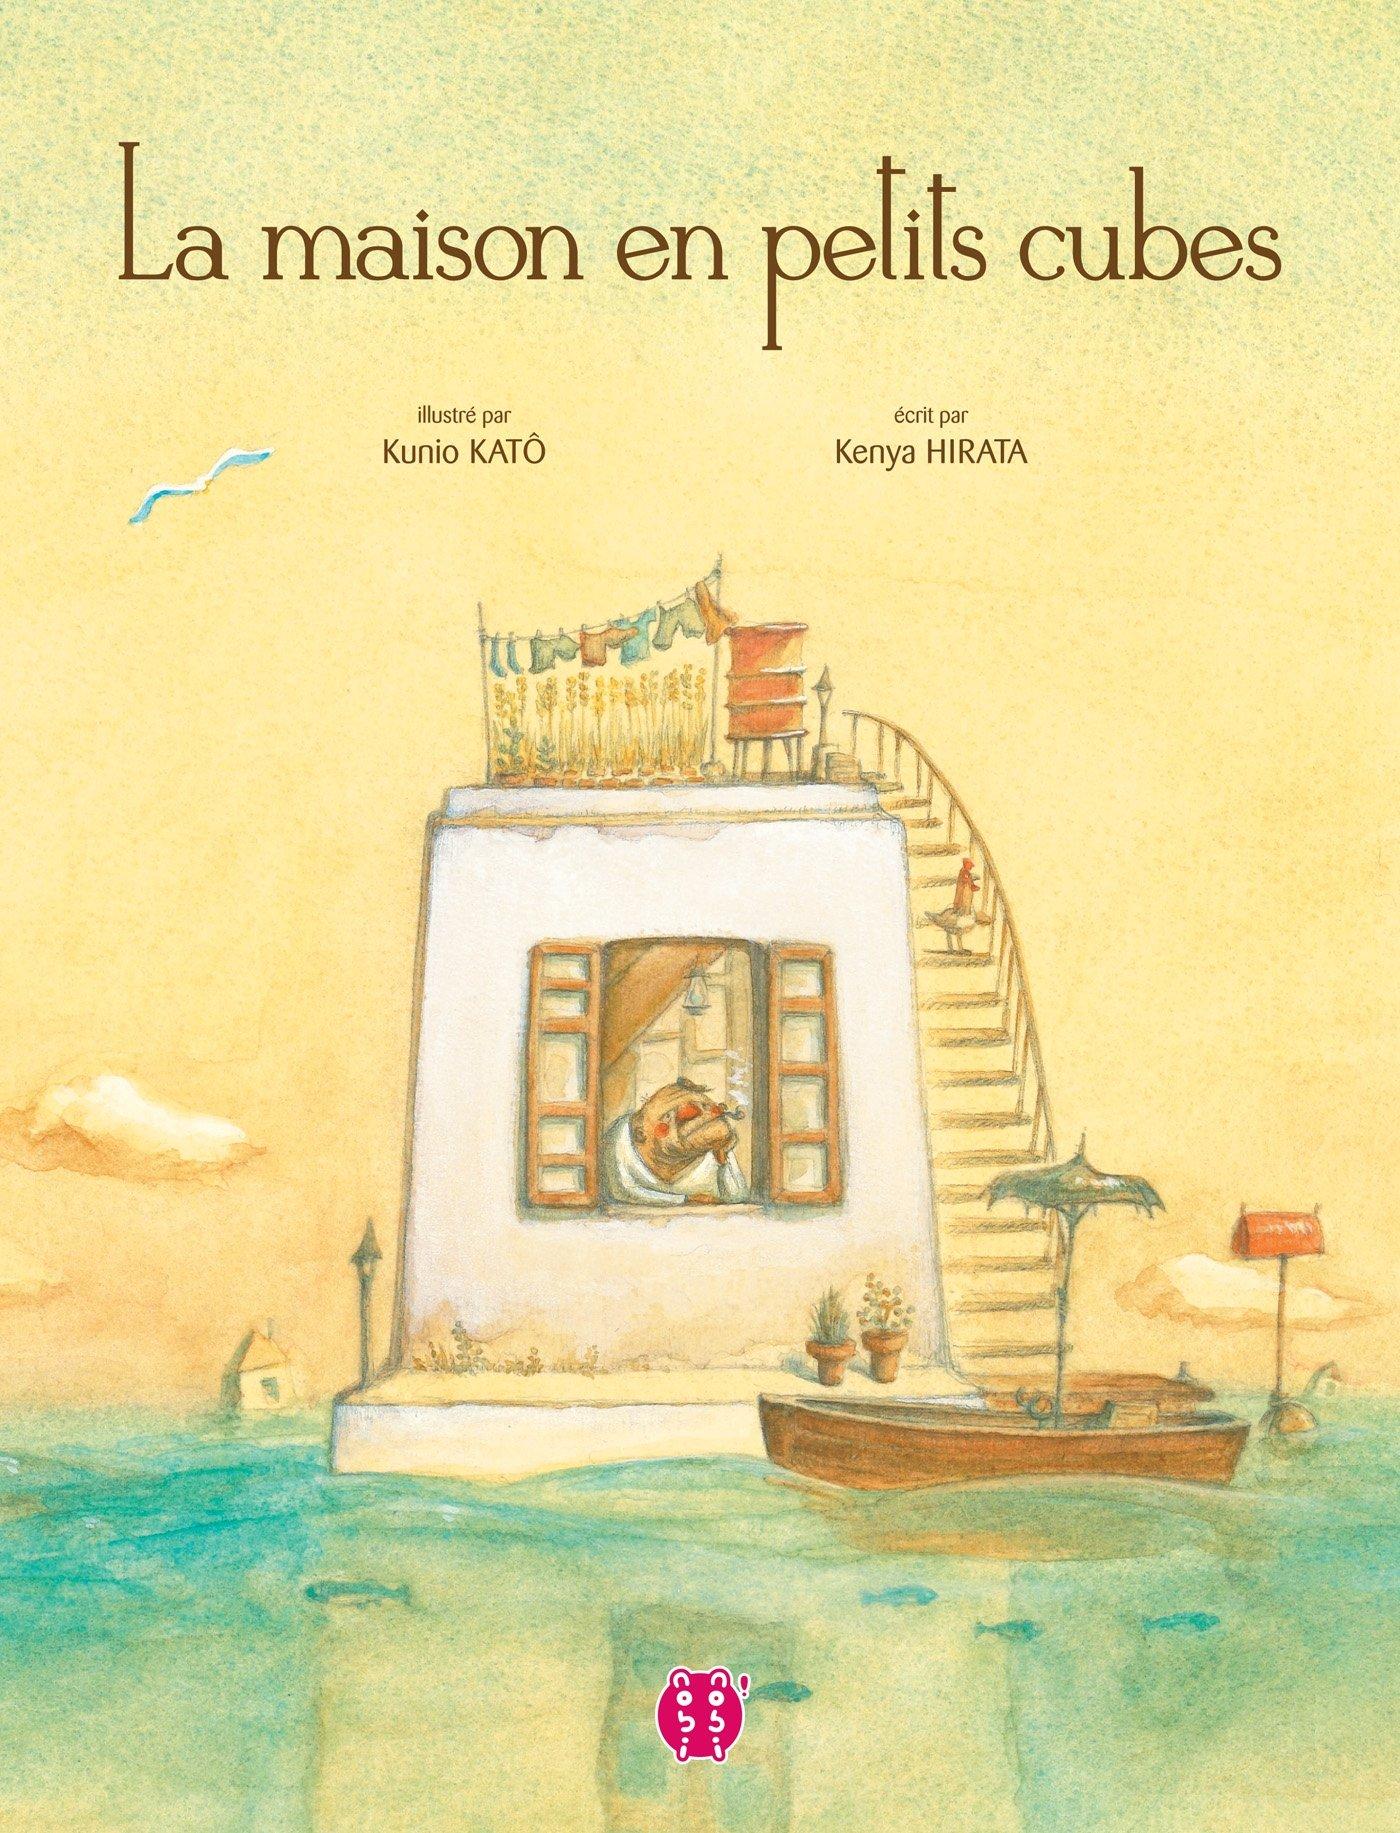 La maison en petits cubes: Amazon.fr: Kenya Hirata, Kunio Katô: Livres